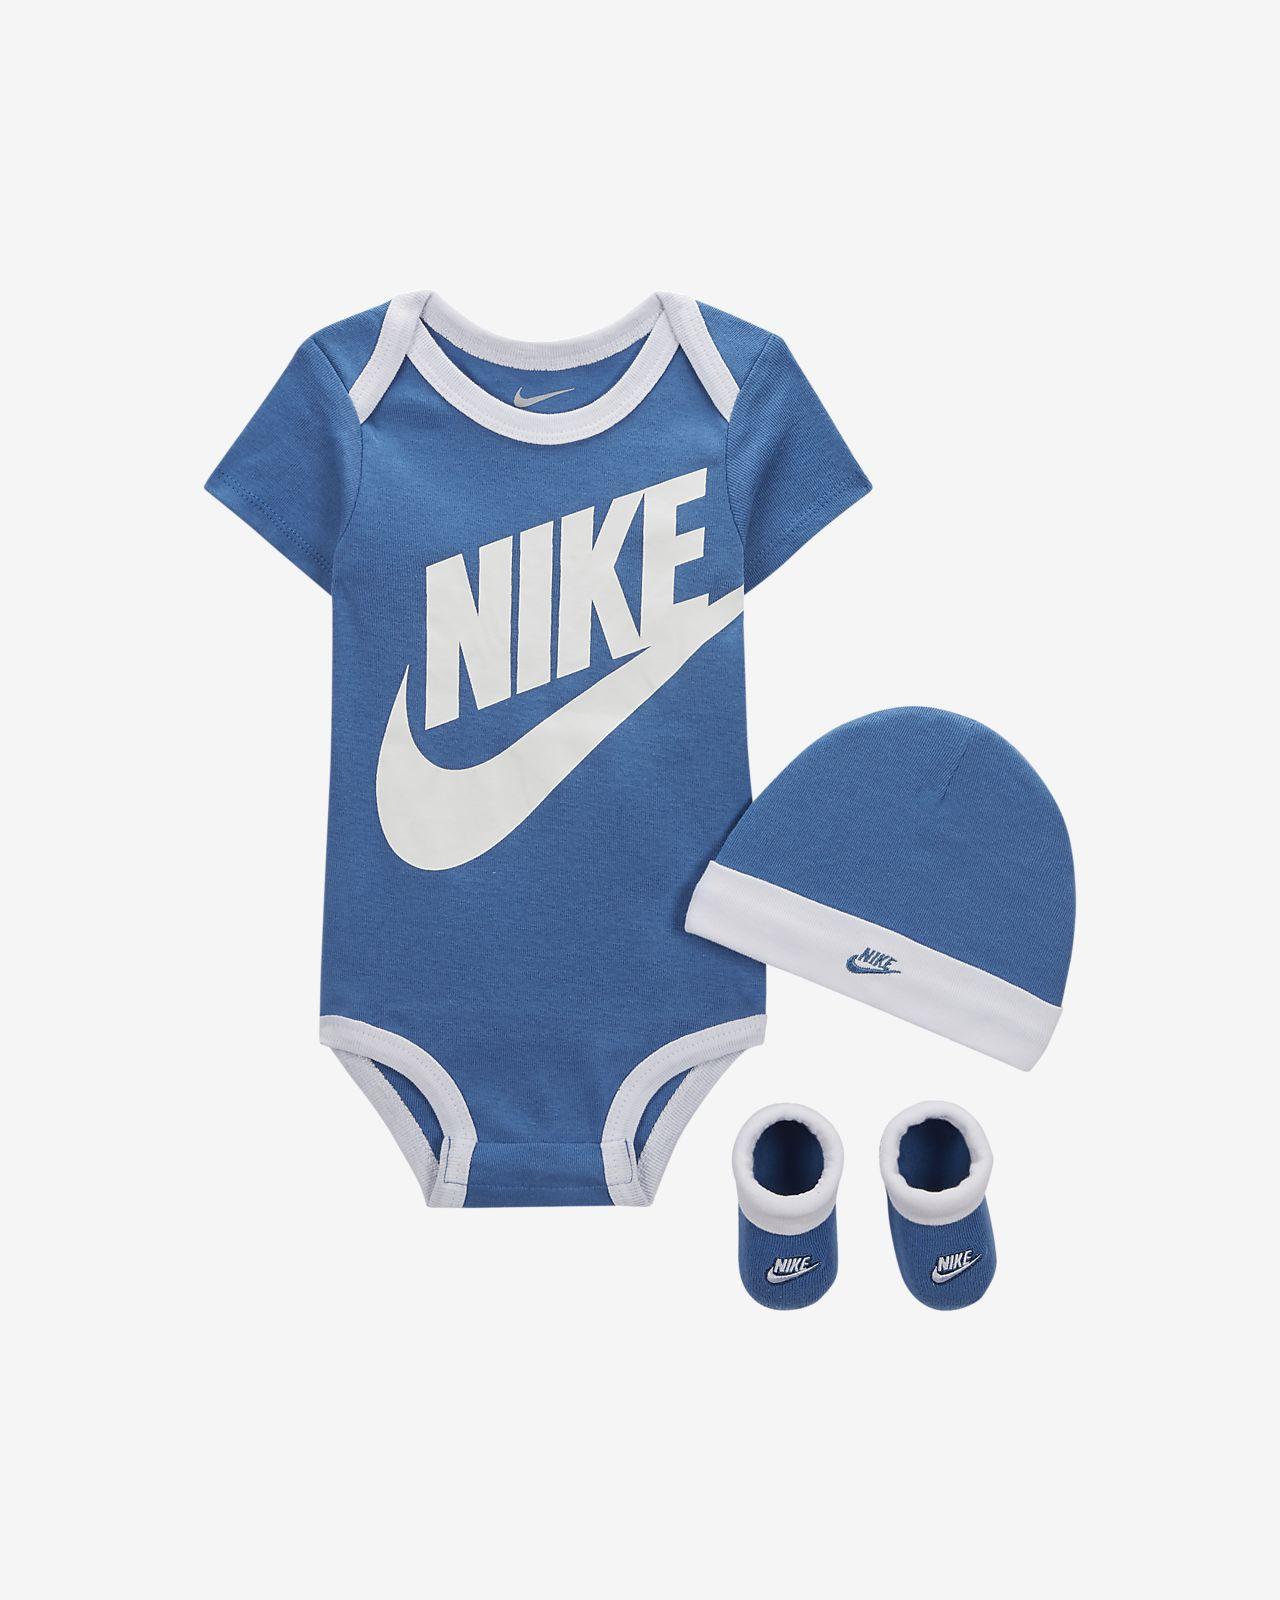 Nike Sportswear Baby Bodysuit, Beanie and Booties Set